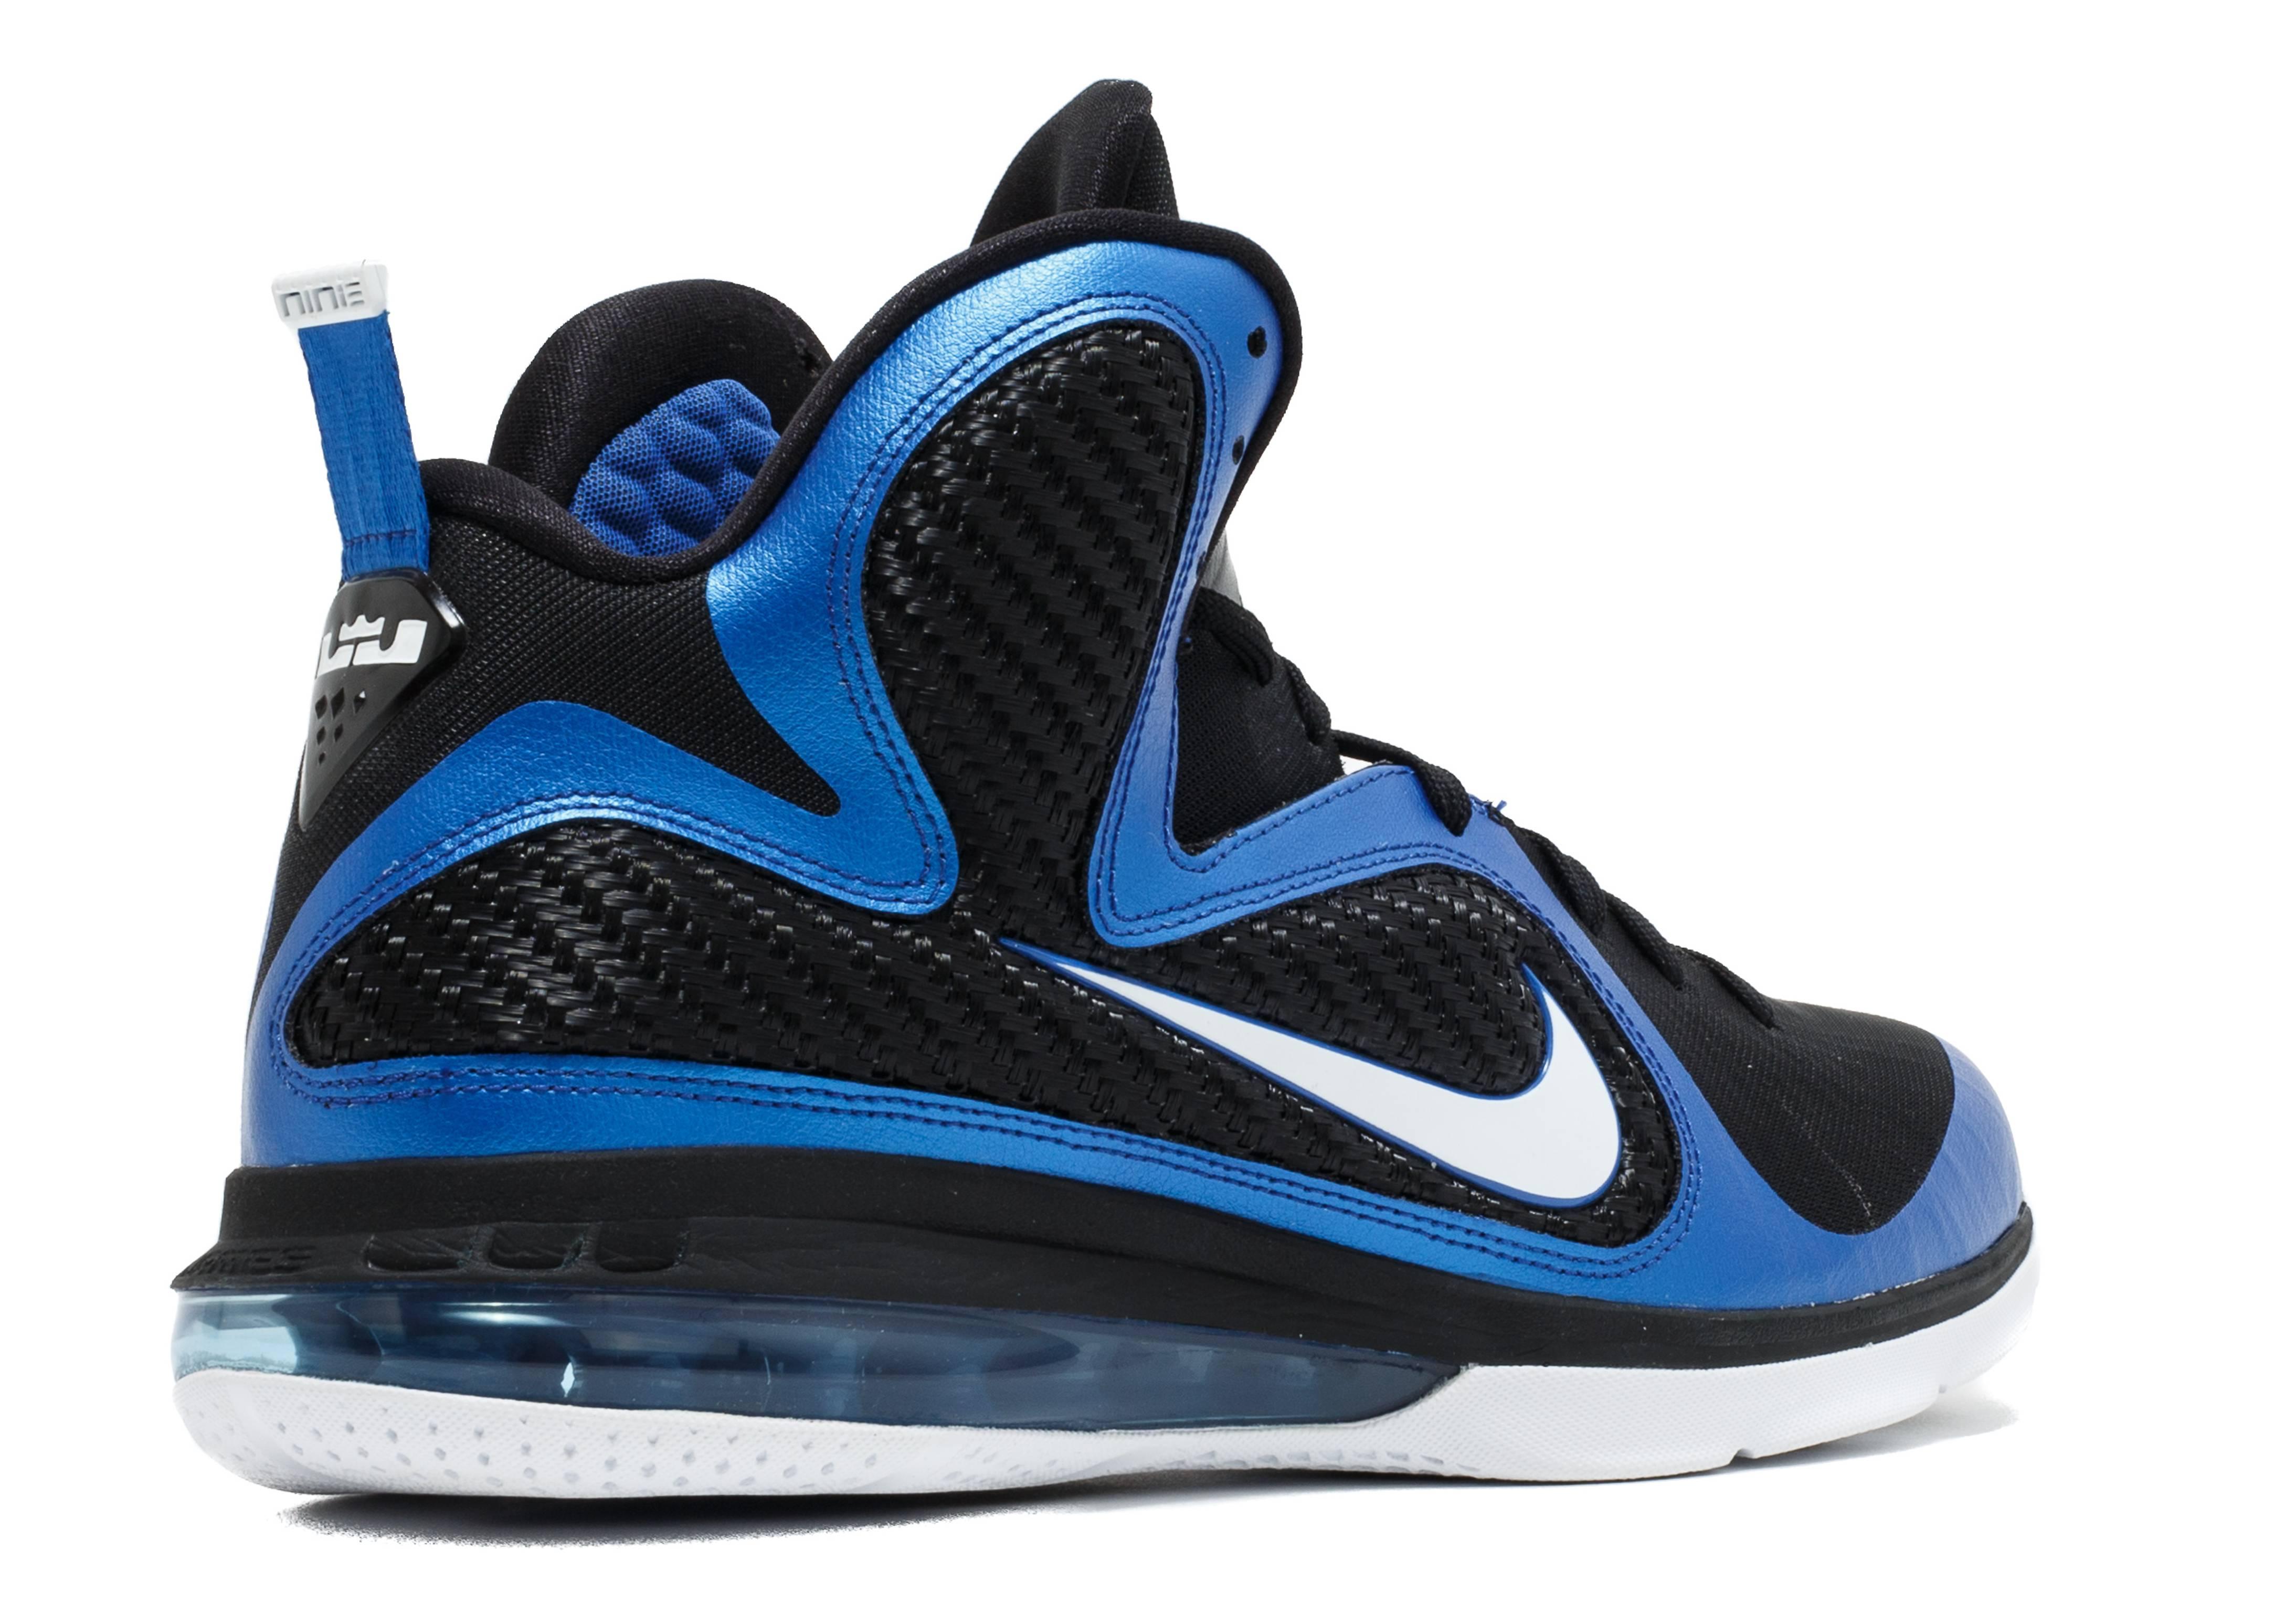 �9�+��ky����a_Lebron9kentucky-Nike-469764400-varsityroyal/white-black|FlightClub